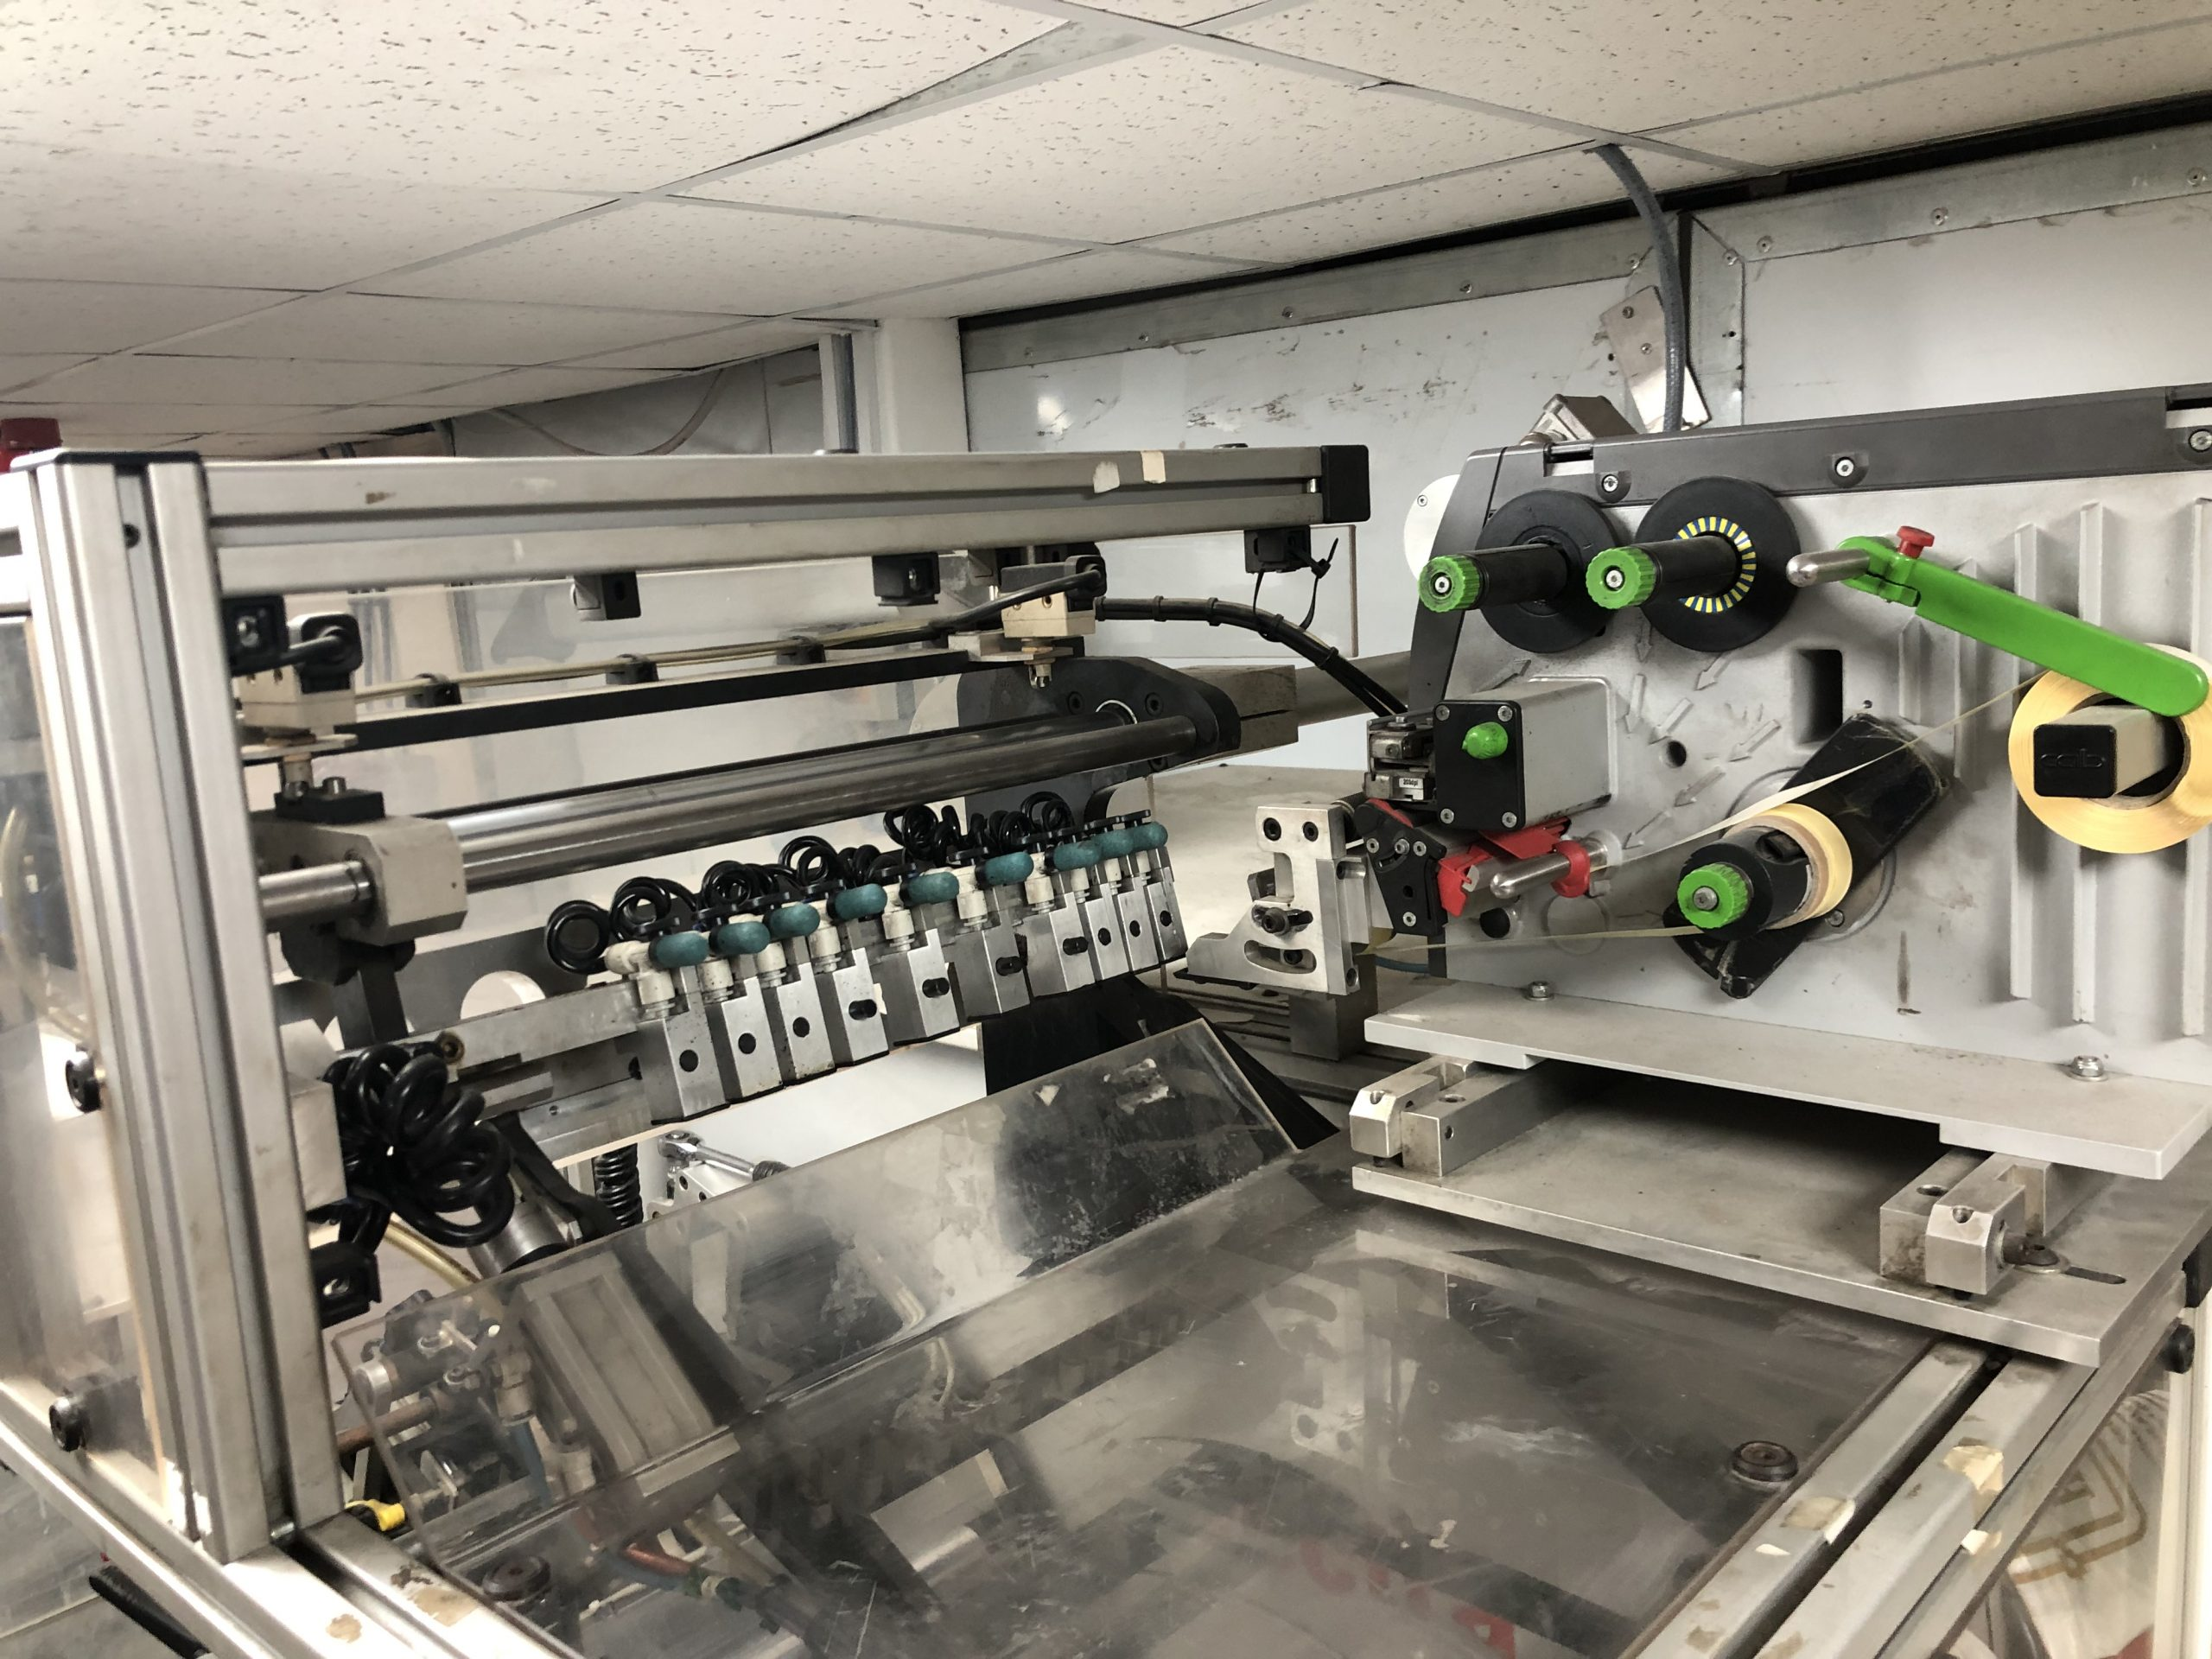 ABG Omega 330 + ABG Vectra SGTR 330 - Used Flexo Printing Presses and Used Flexographic Equipment-5